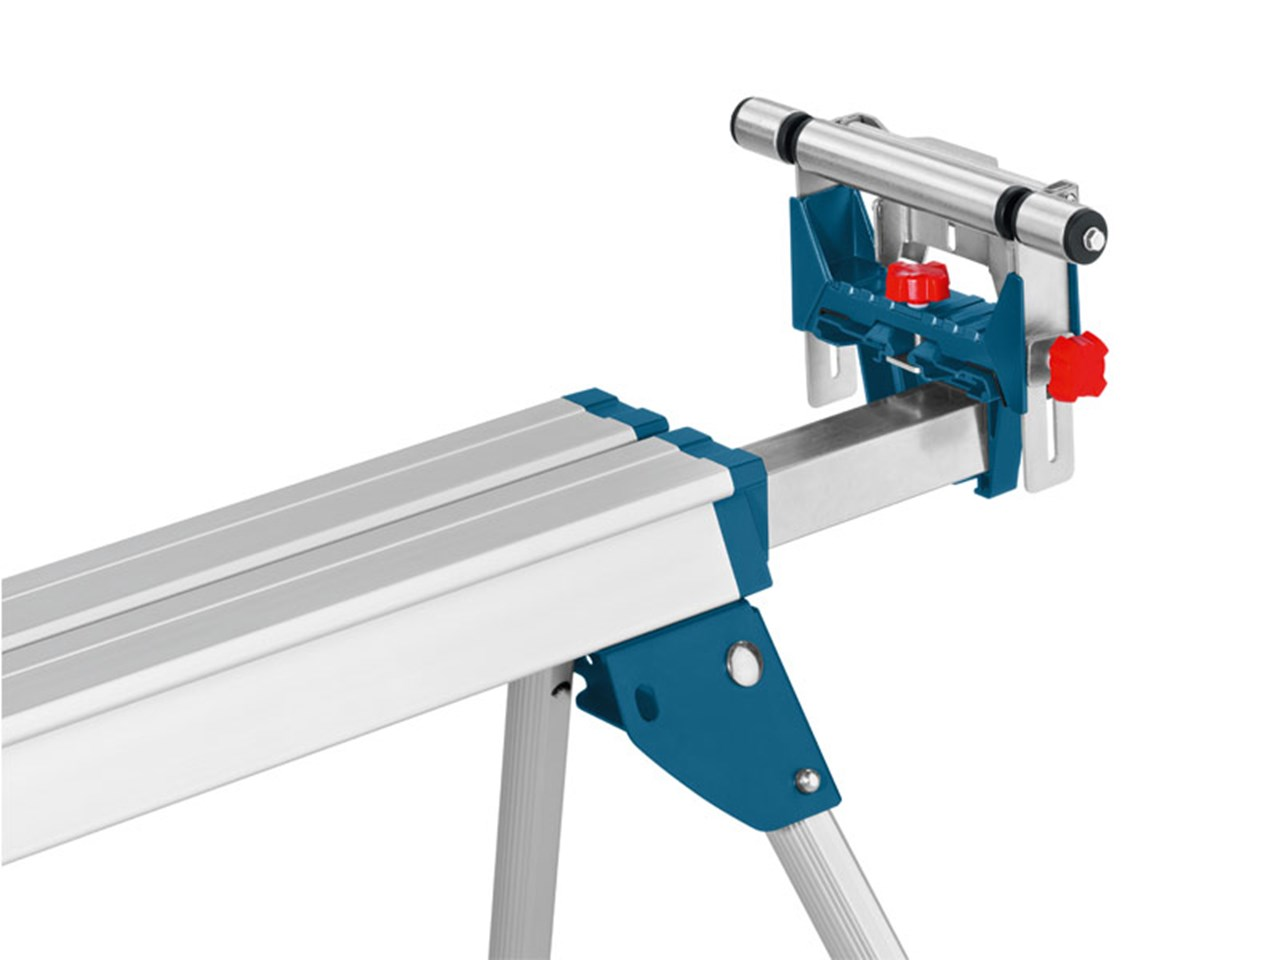 Bosch Gta3800 Folding Leg Mitre Saw Stand